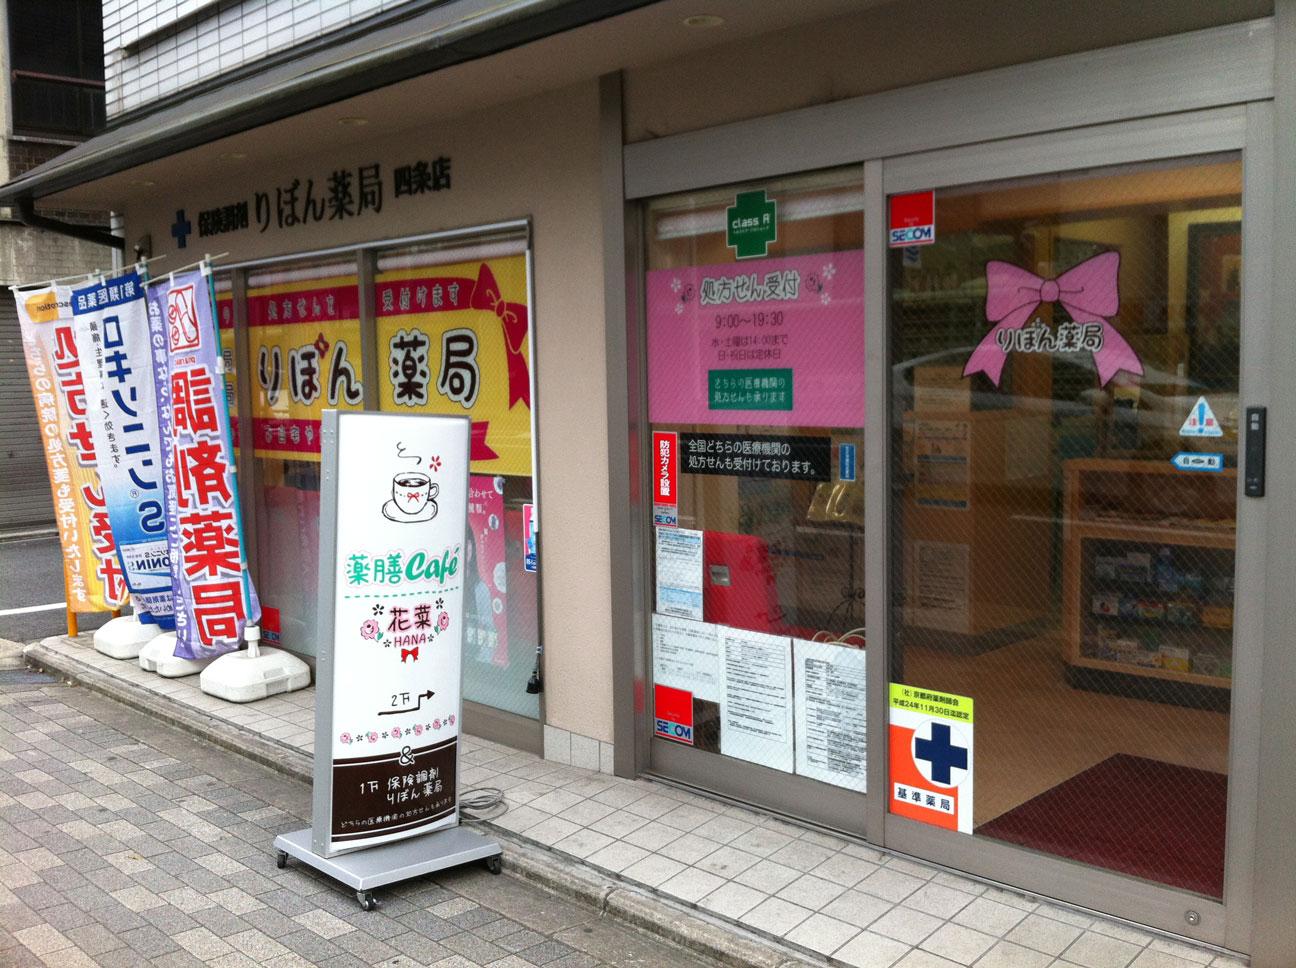 Gojo Cafe And Restaurant